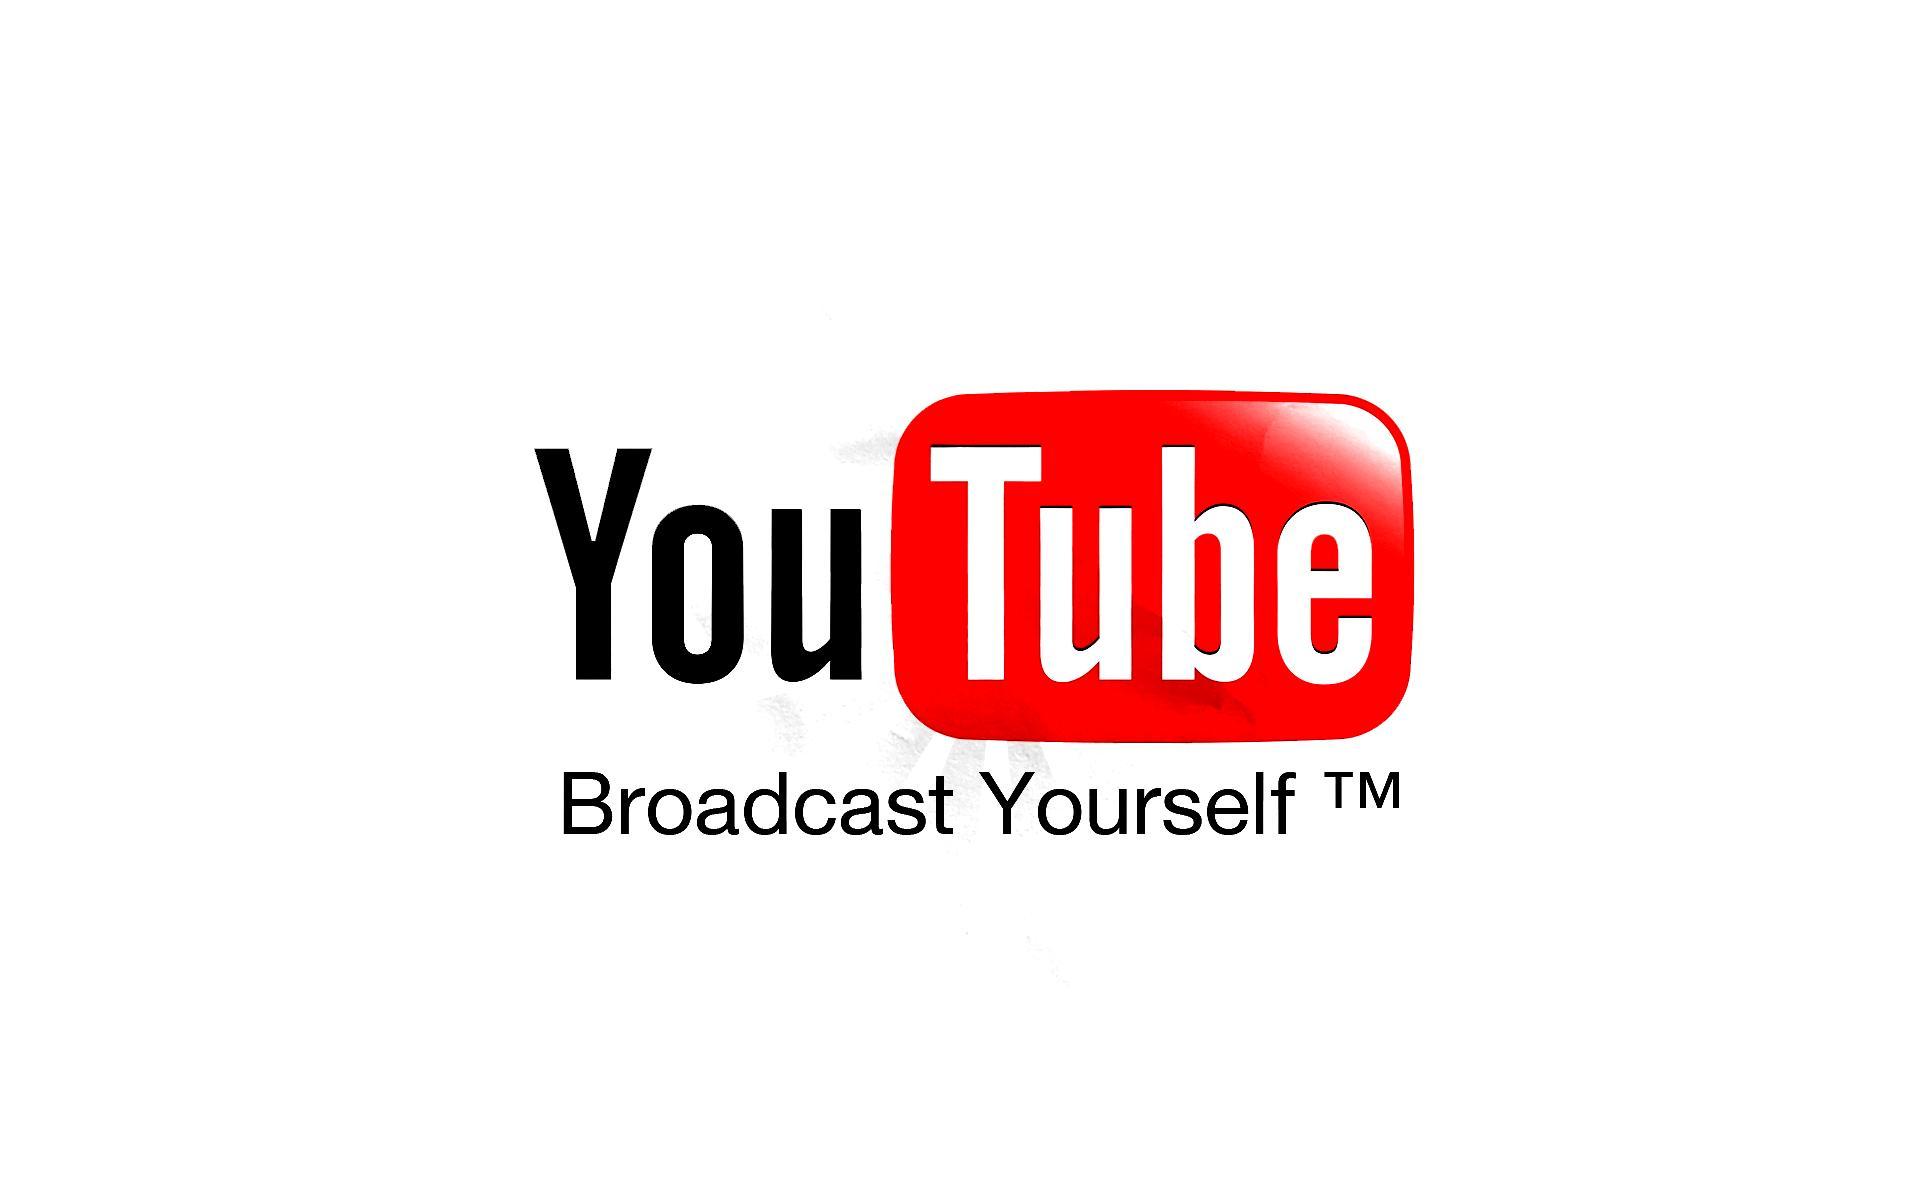 Youtube 1920x1200 Download Hd Wallpaper Wallpapertip